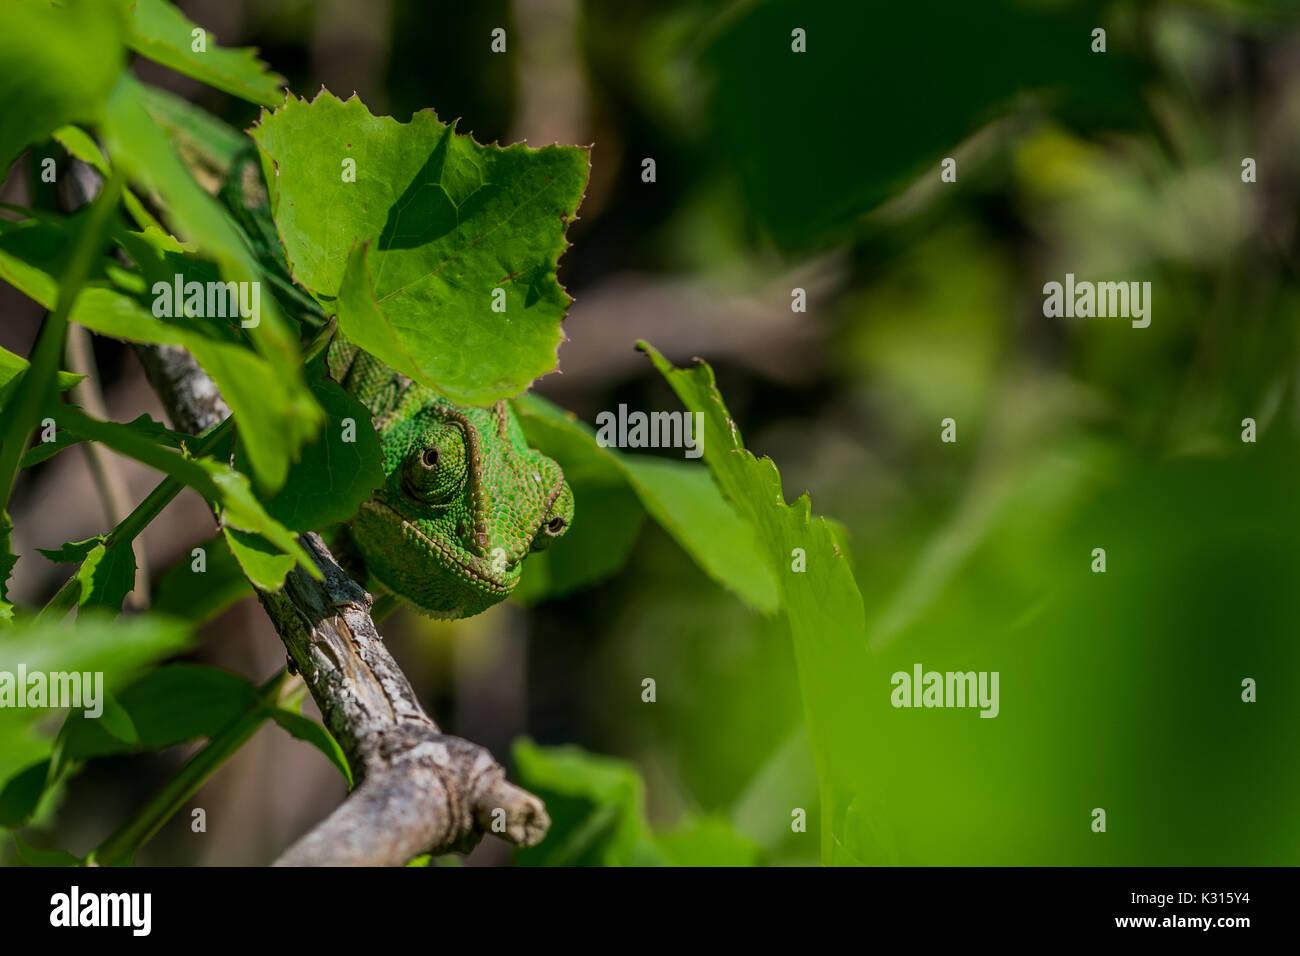 A well camouflaged Mediterranean Chameleon (Chamaeleo chamaeleon) peeking from behind some leaves. Malta - Stock Image